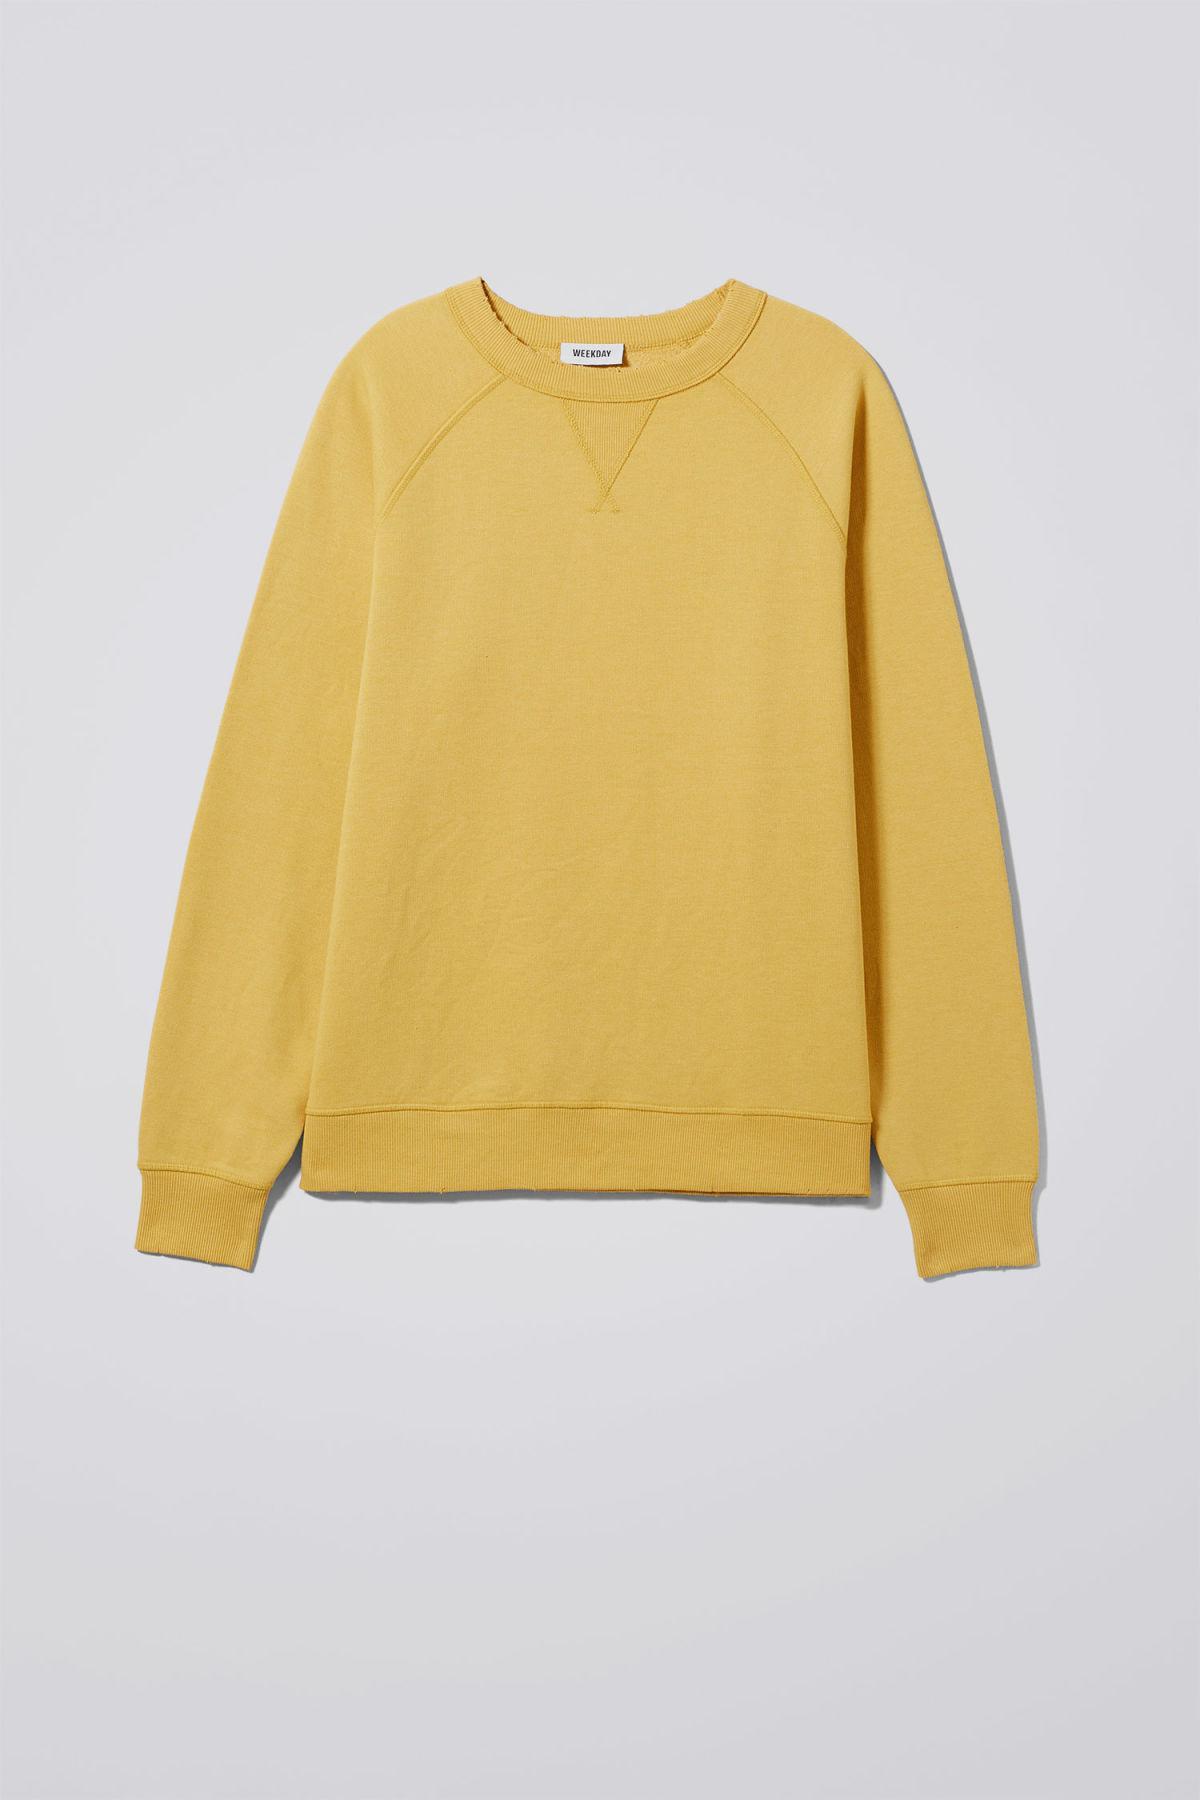 Weekday Cotton Jaxon Washed Sweatshirt in Yellow for Men